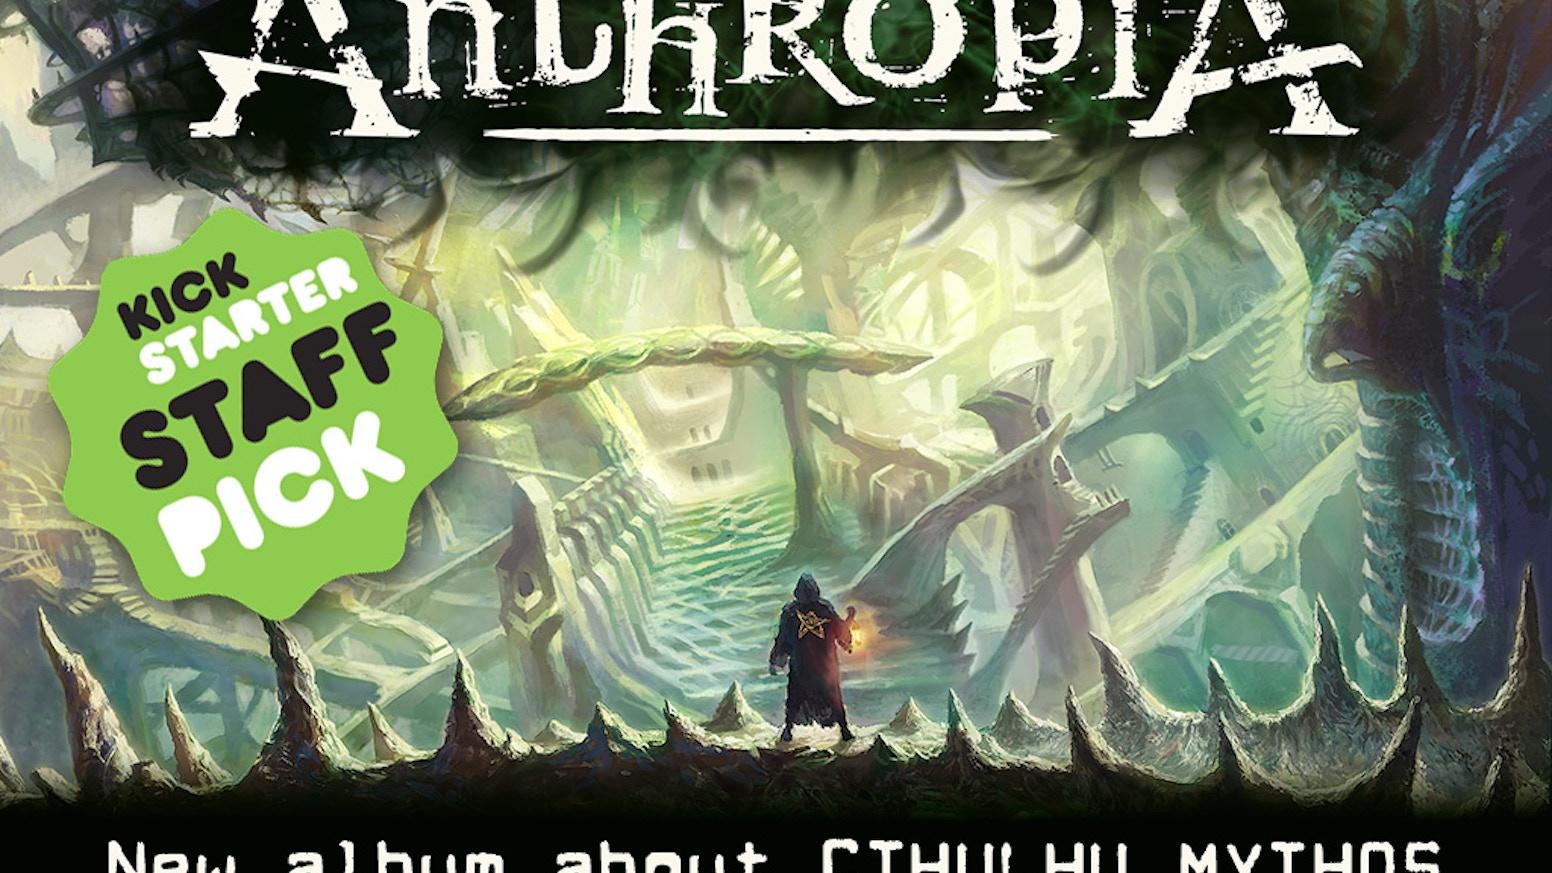 "Help us release ""Non-Euclidean Spaces"", our new album based on Cthulhu Mythos, featuring Arjen Lucassen & Edu Falaschi."